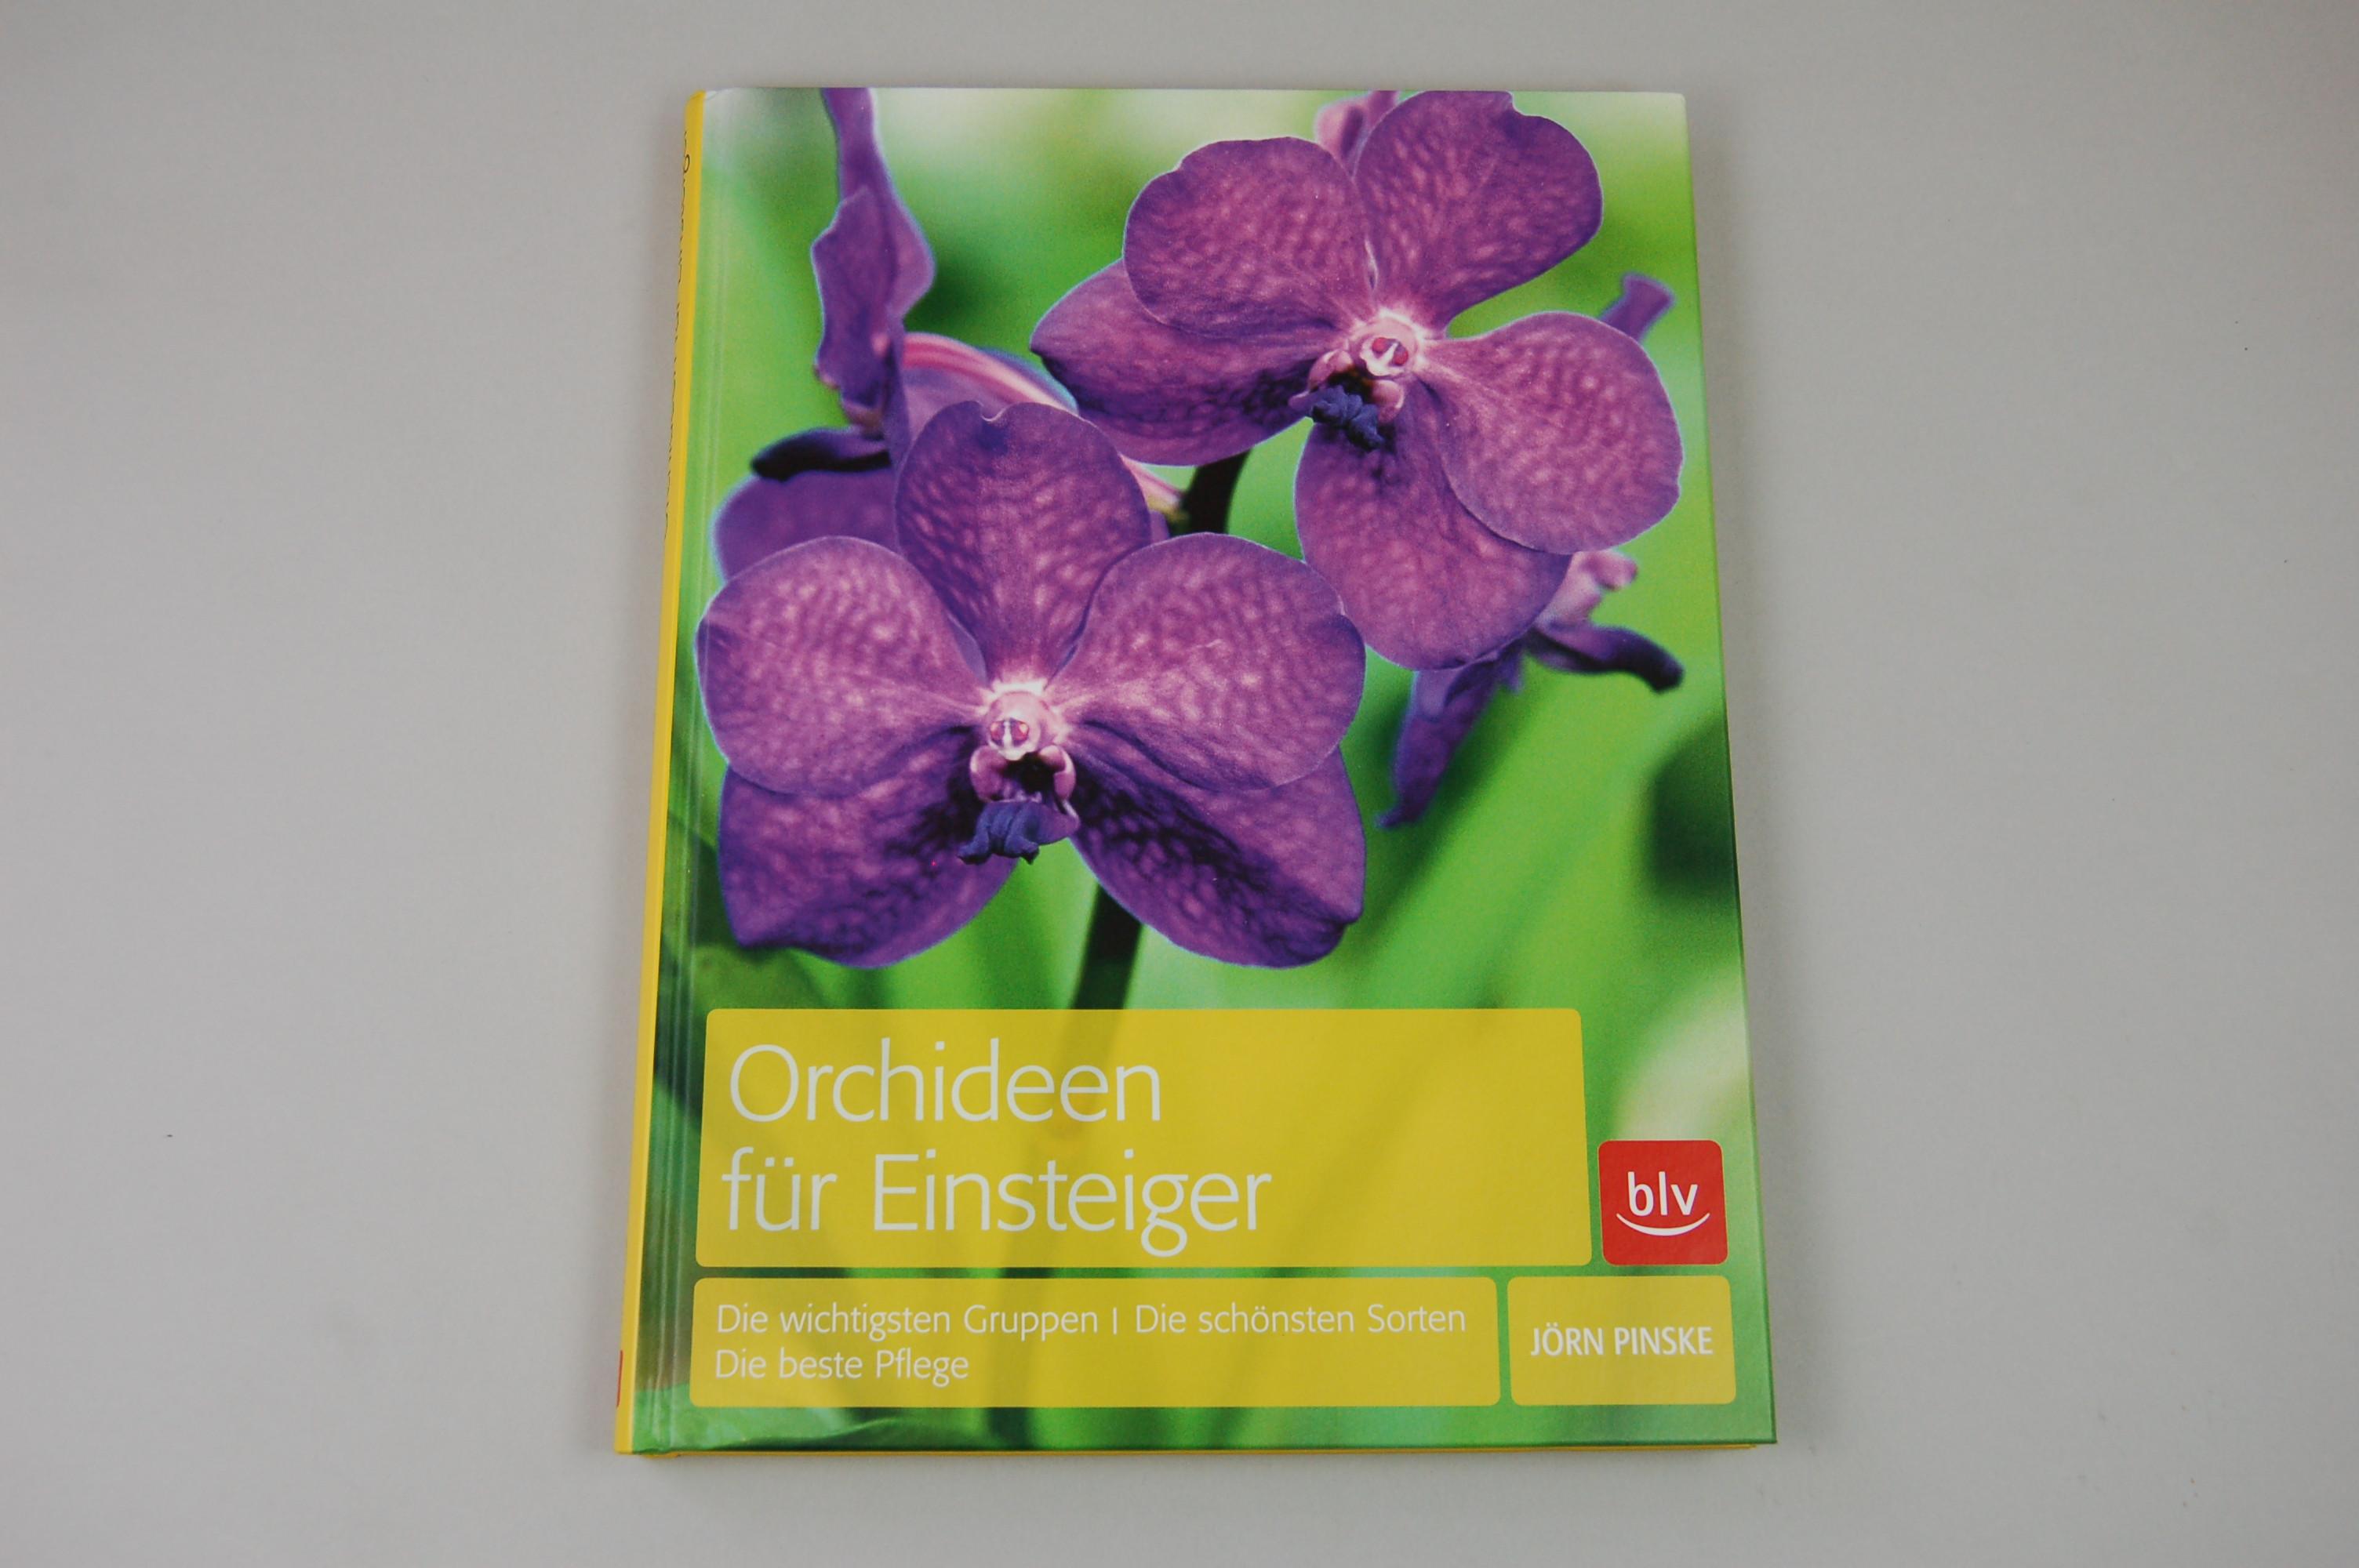 orchideen f r einsteiger. Black Bedroom Furniture Sets. Home Design Ideas